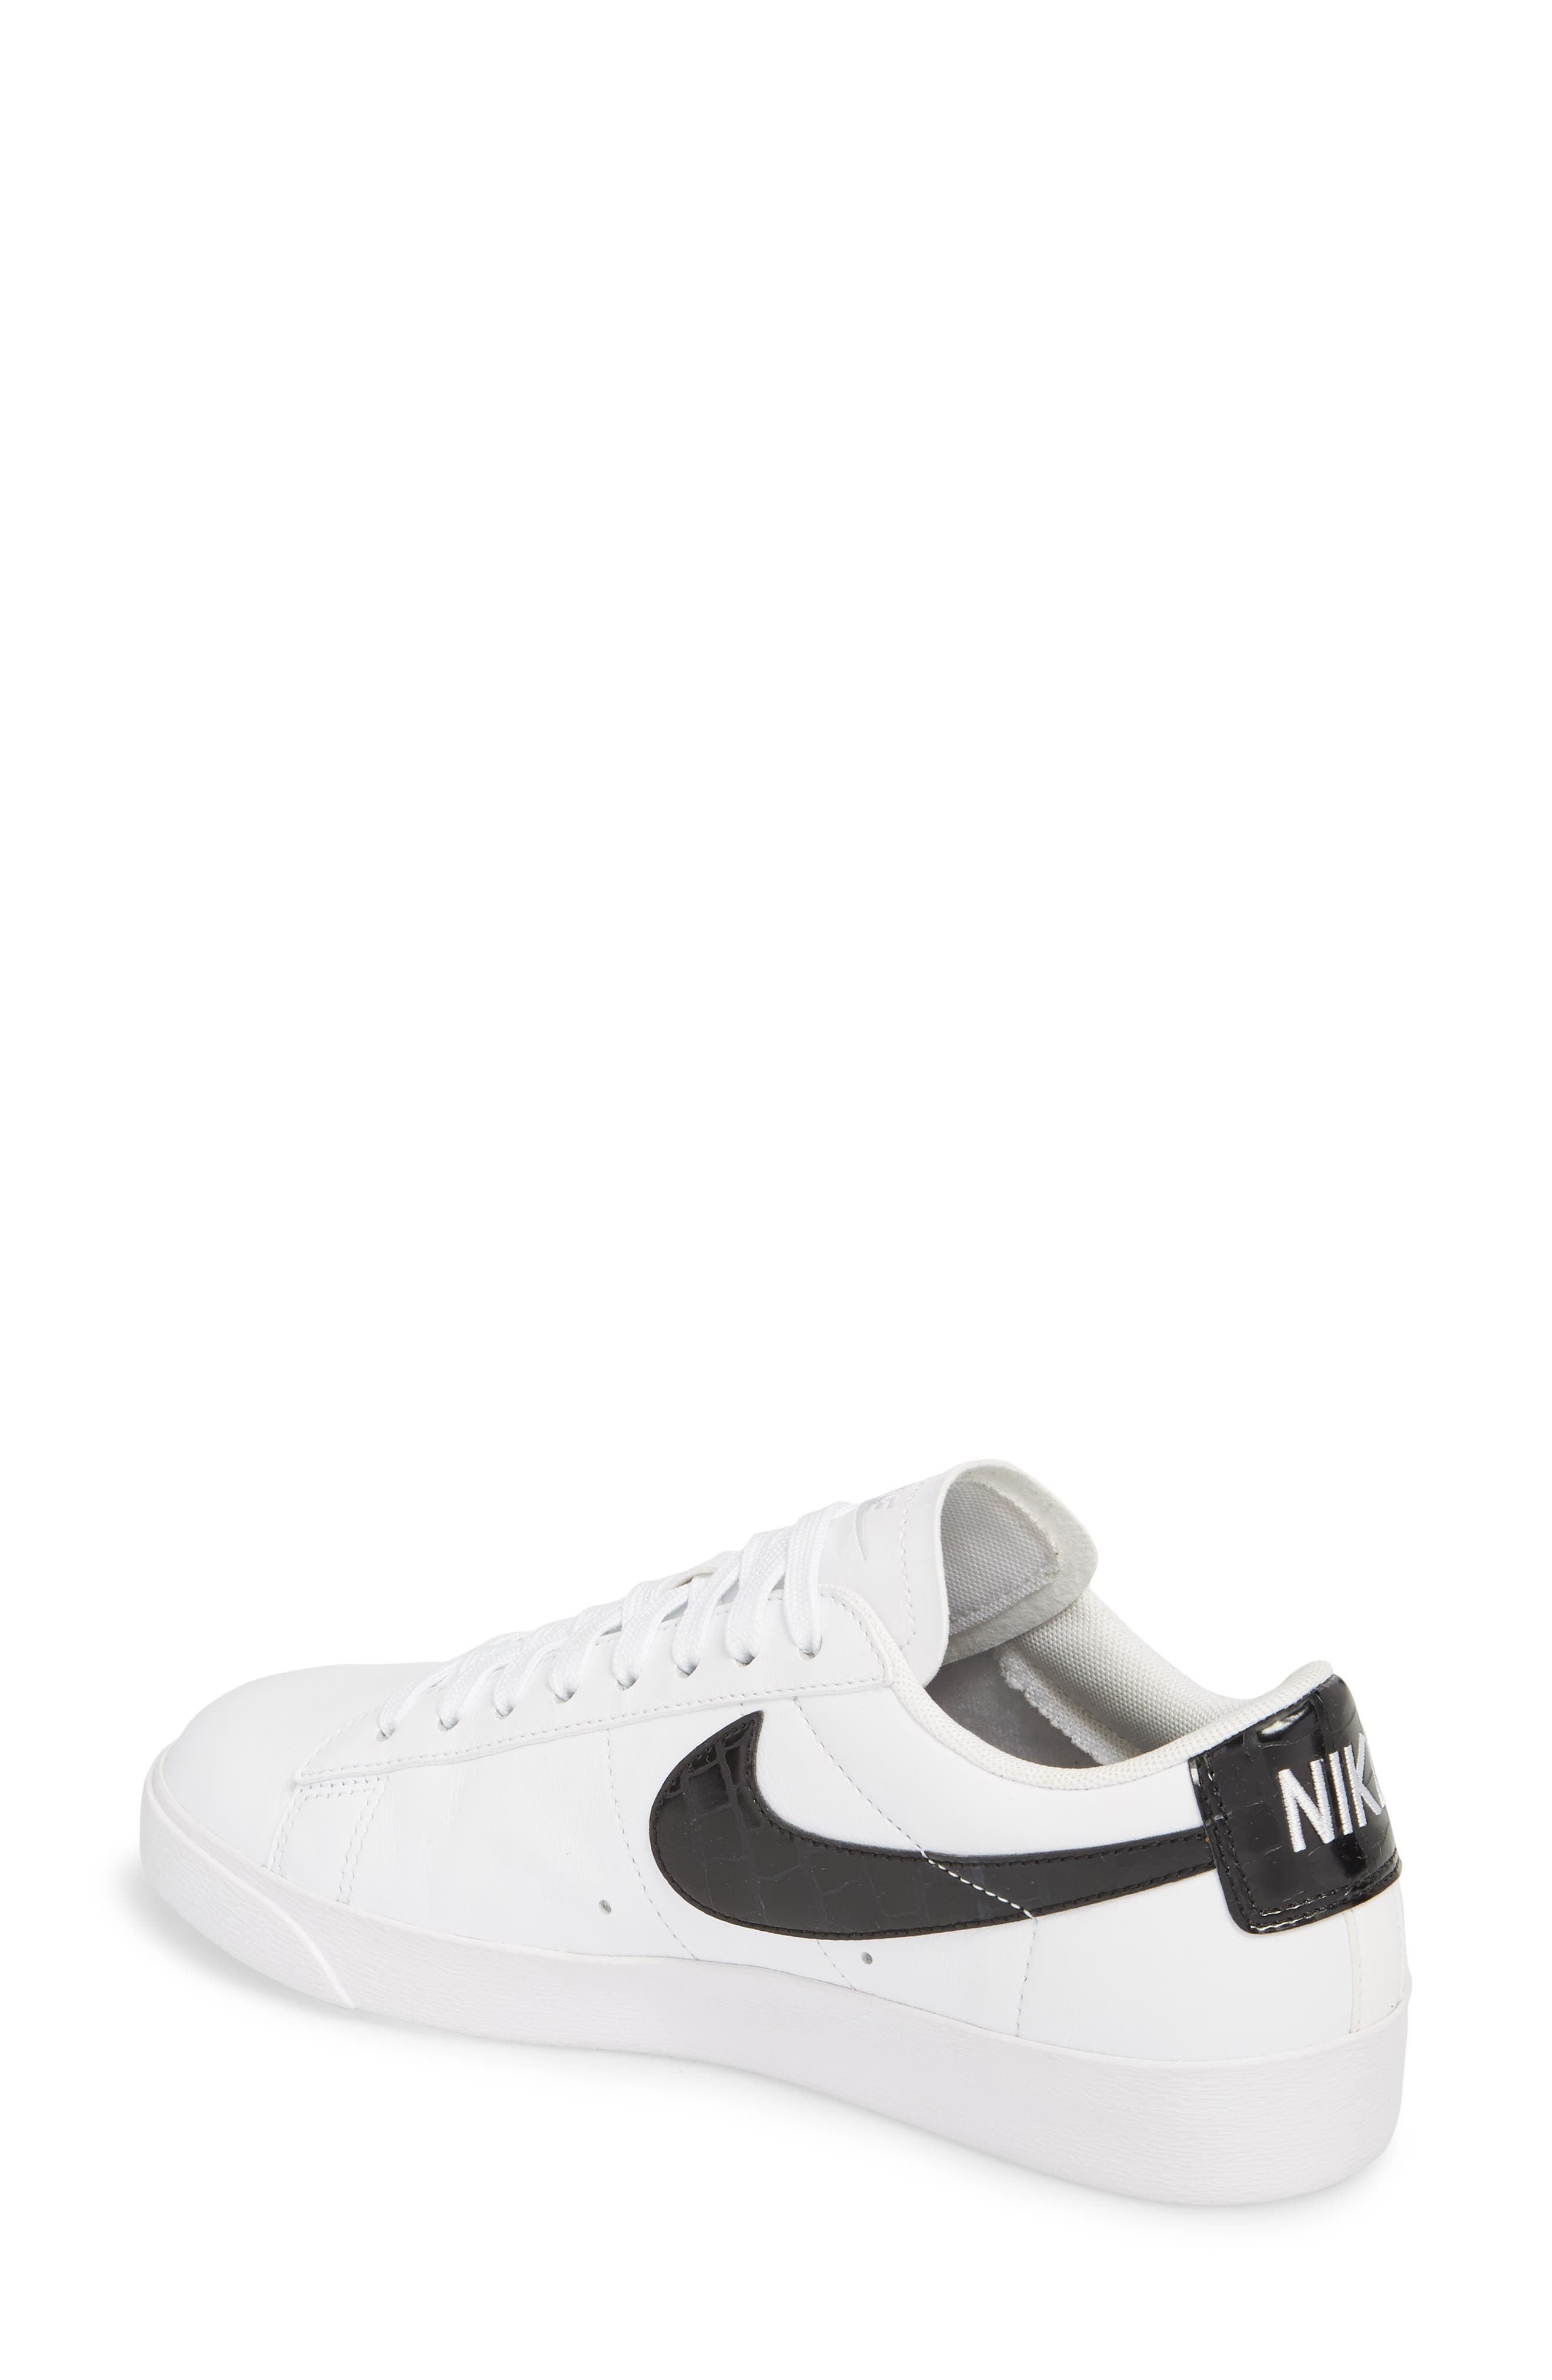 Blazer Low Essential Sneaker,                             Alternate thumbnail 2, color,                             100